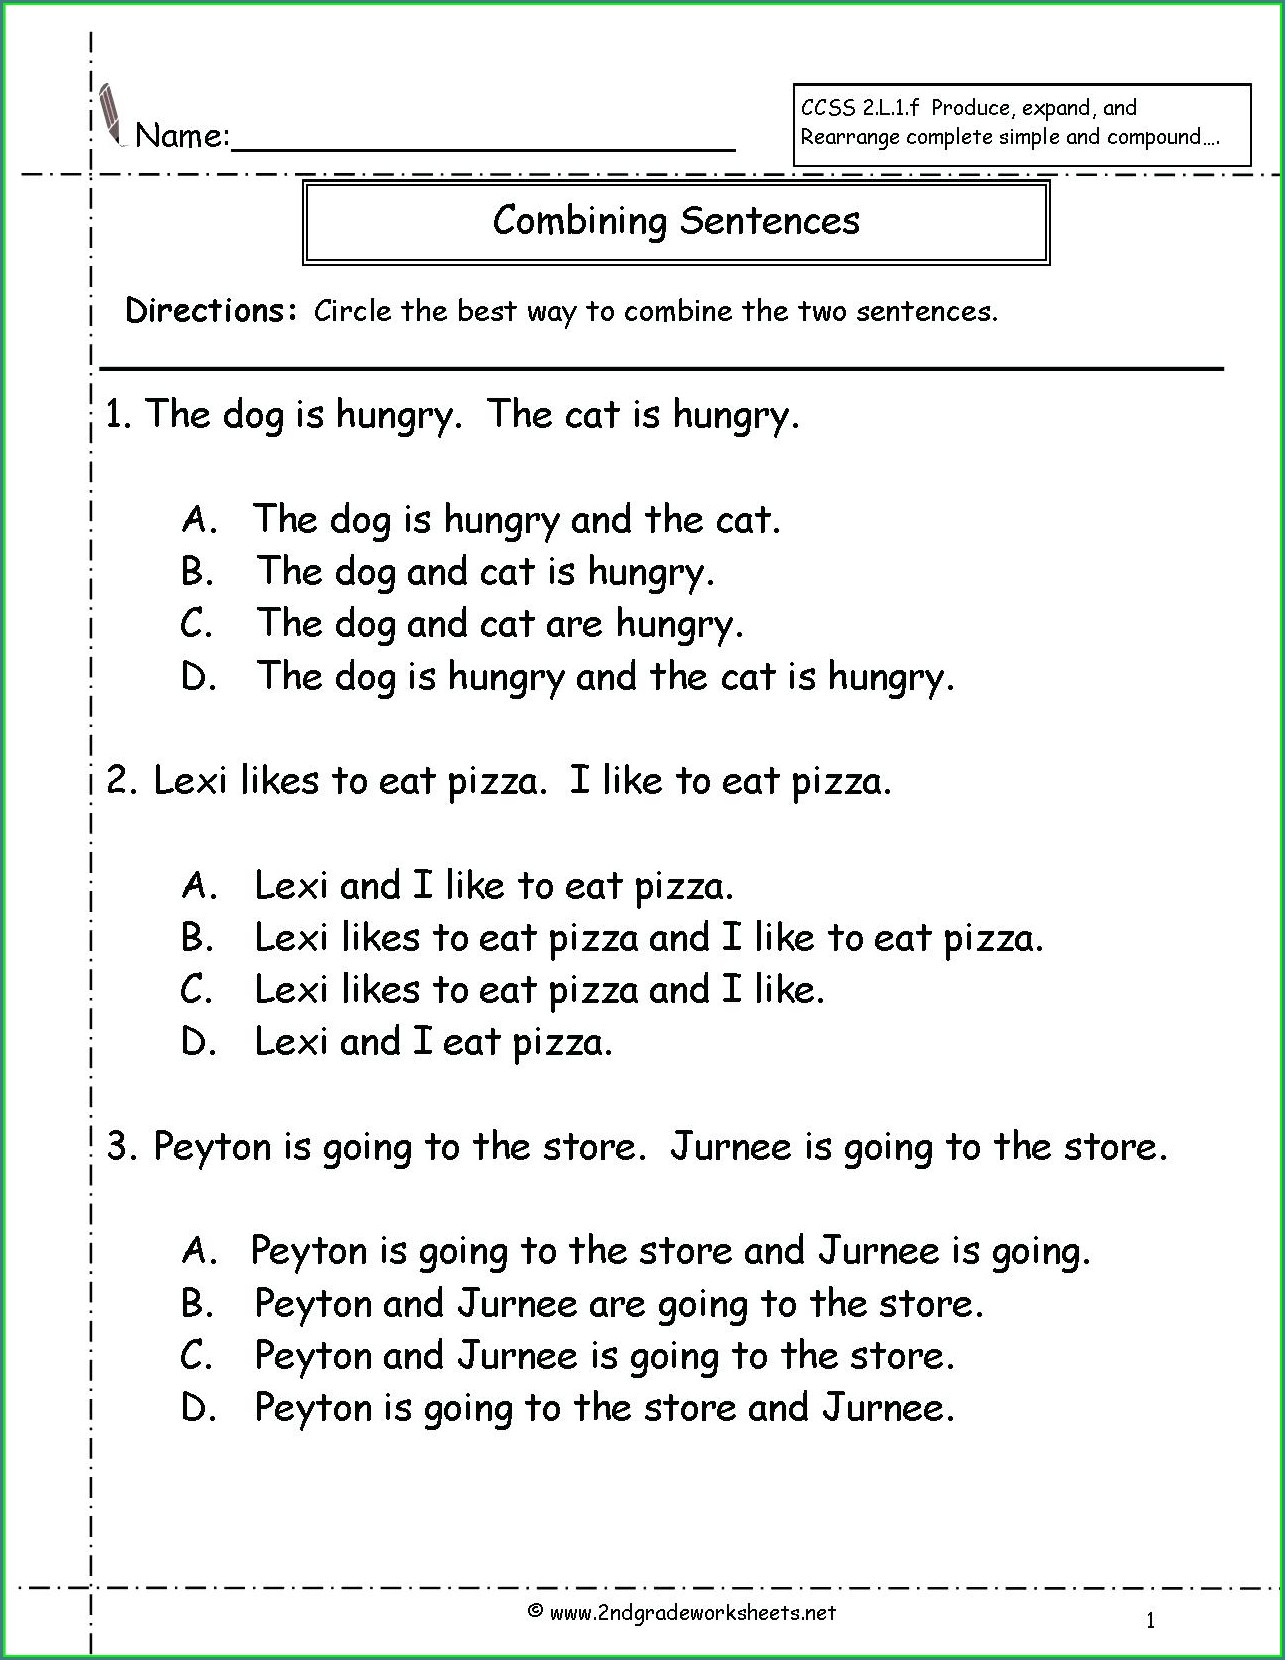 Writing Sentences Worksheets For 6th Grade Worksheet